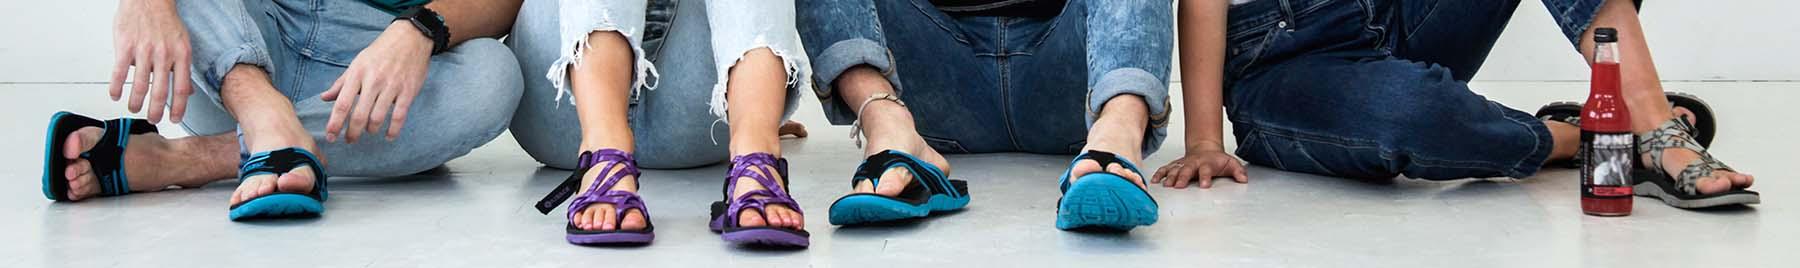 sandals-banner-thin.jpg